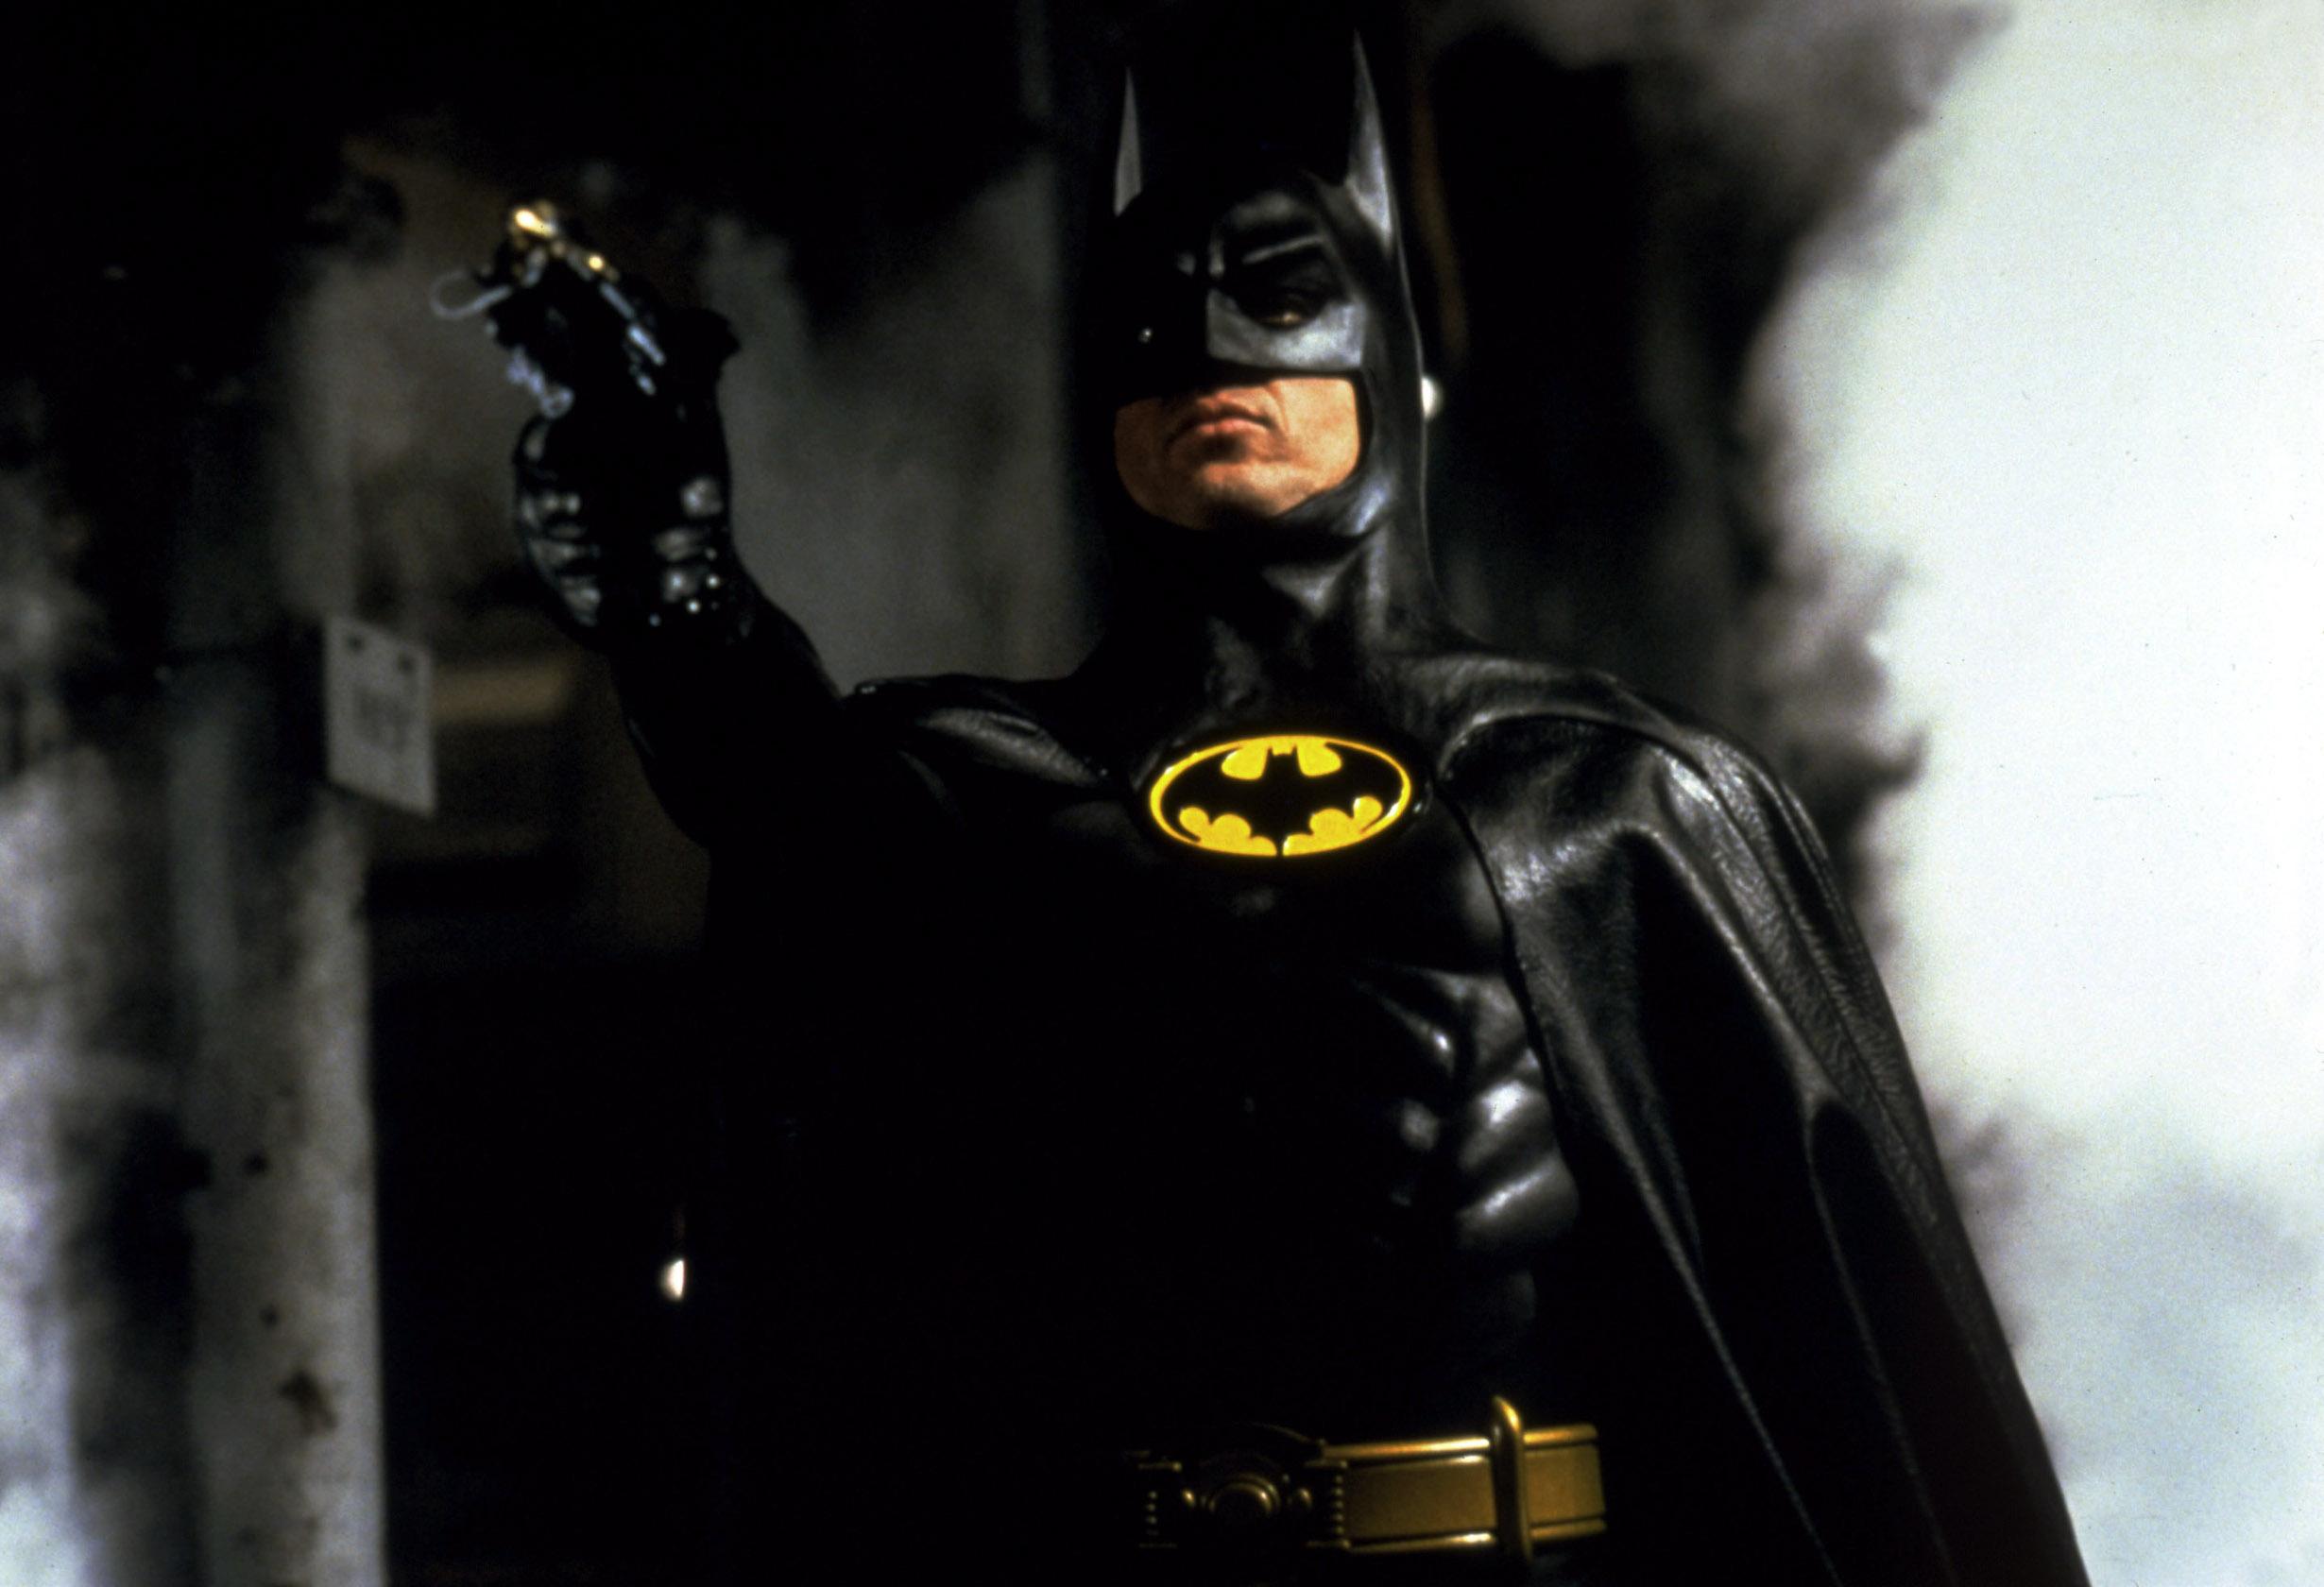 michael-keaton's-bloody-batman-costume-teased-by-'flash'-director-andy-muschietti